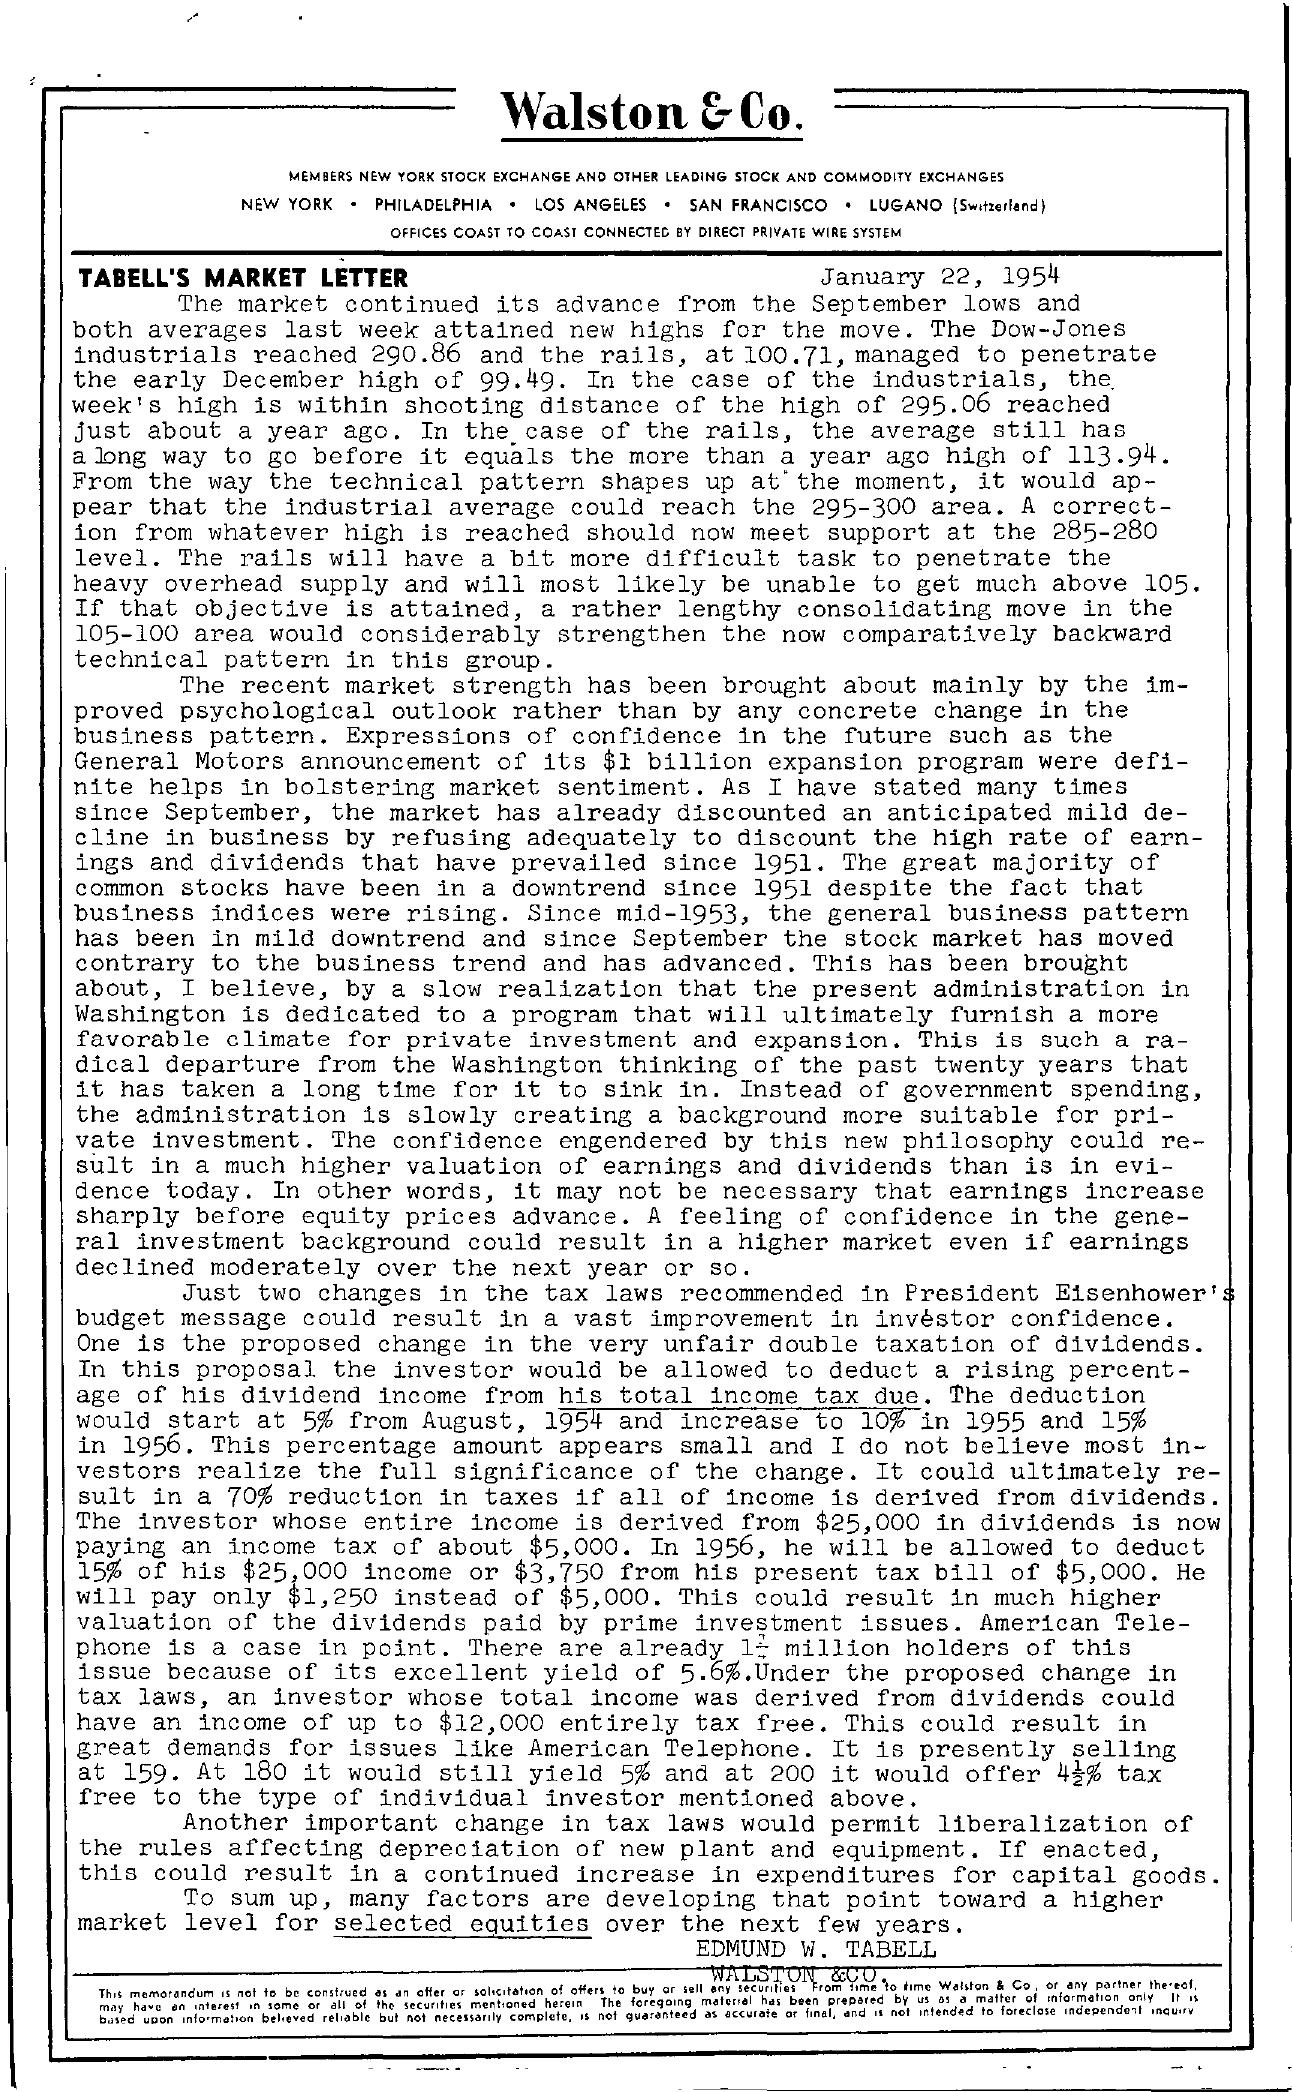 Tabell's Market Letter - January 22, 1954